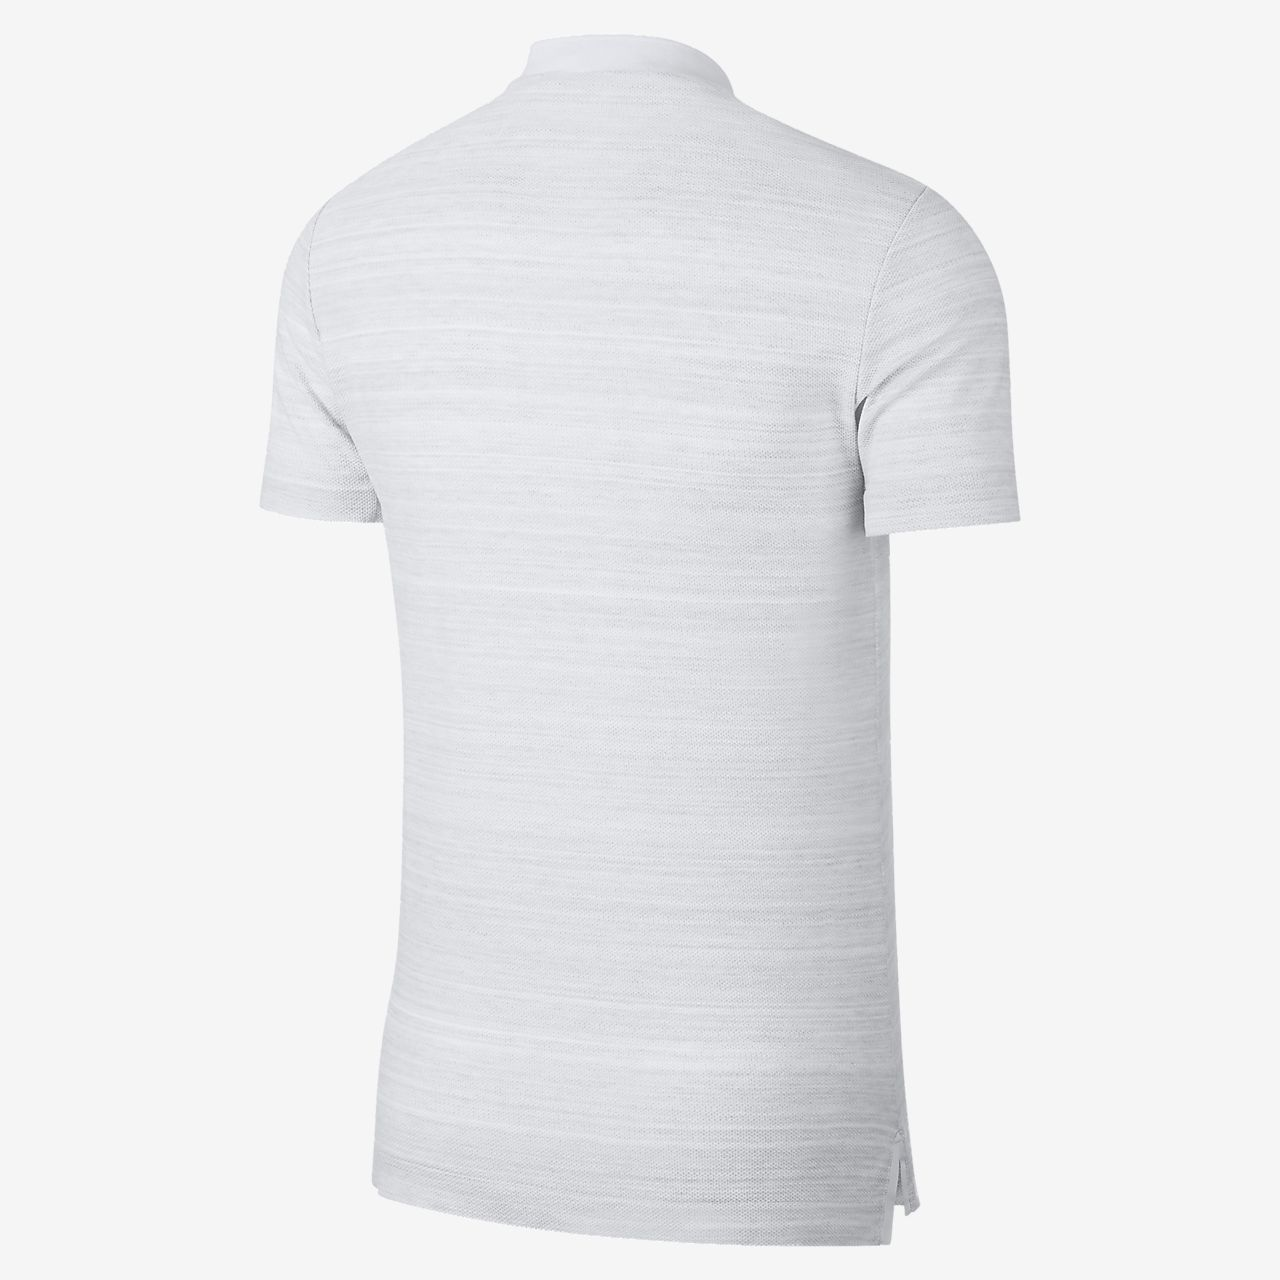 Chelsea FC Authentic Grand Slam Men s Polo. Nike.com SK b07901b7a